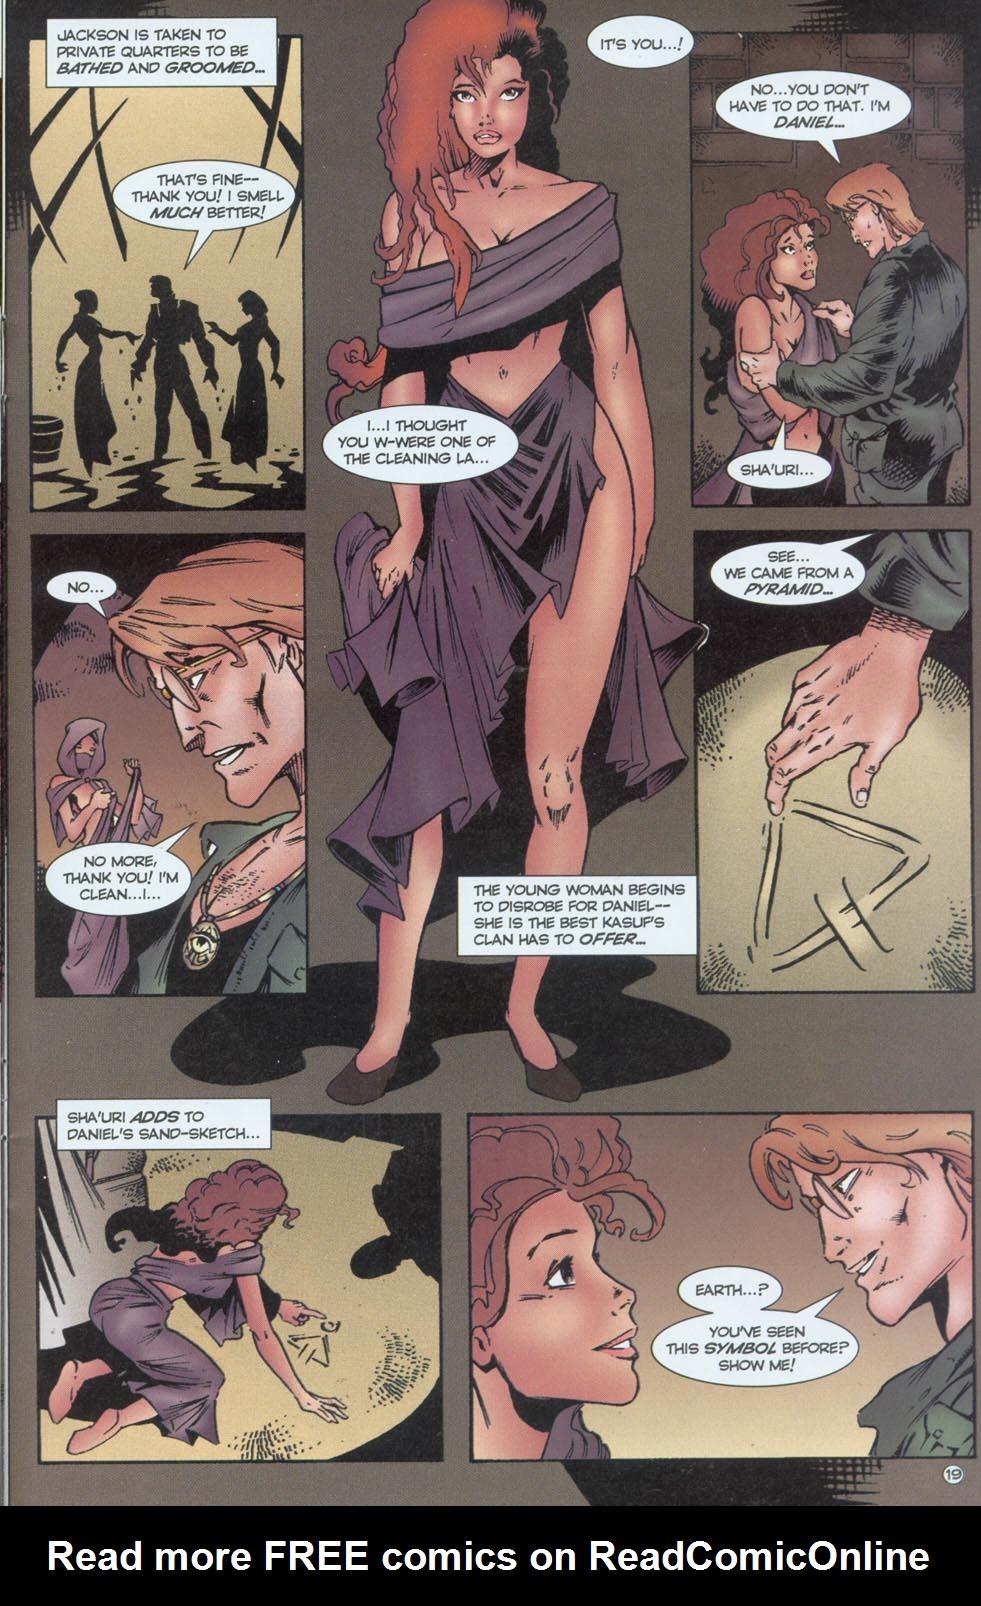 Read online Stargate comic -  Issue #1 - 21